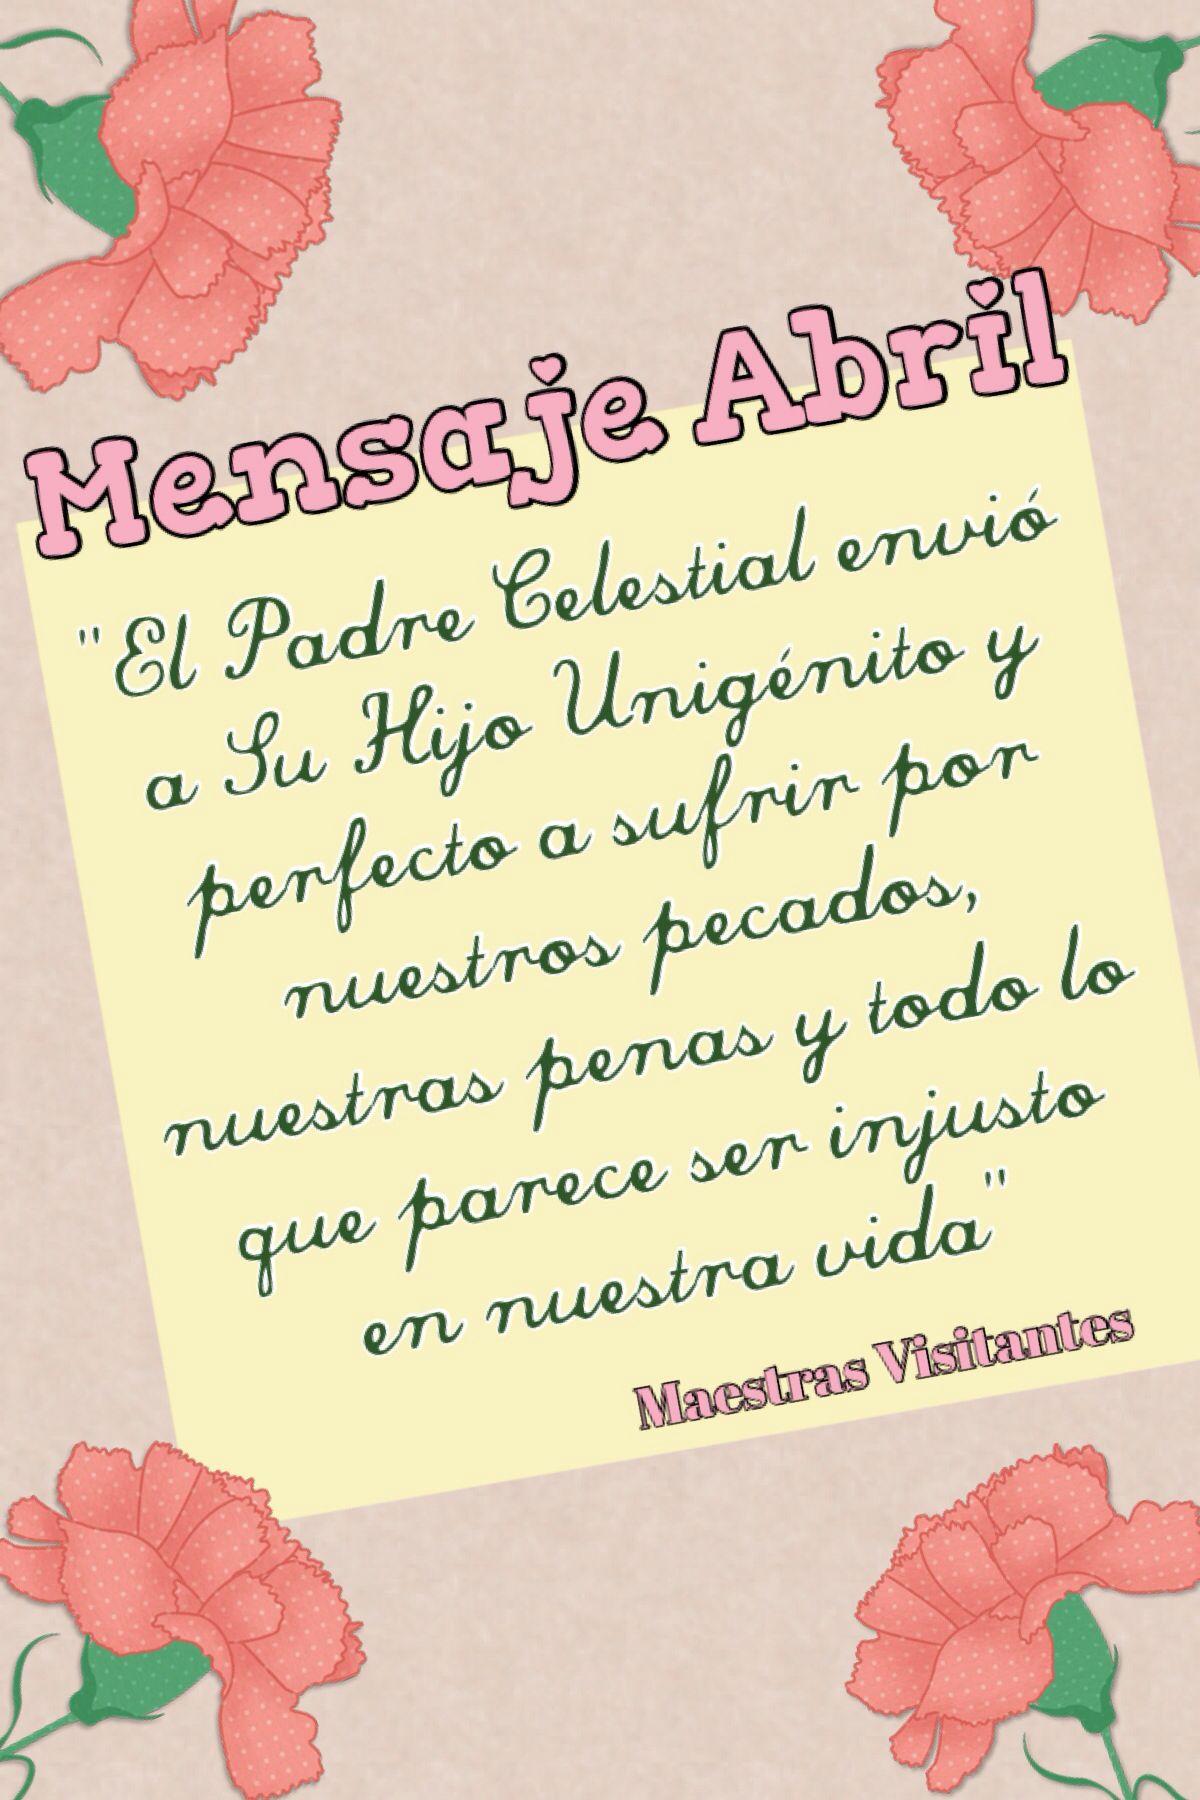 Mensaje Abril Maestras Visitantes Sud Maestrasvisitantes Sociedaddesocorro Relief Society Visiting Teaching Socorro